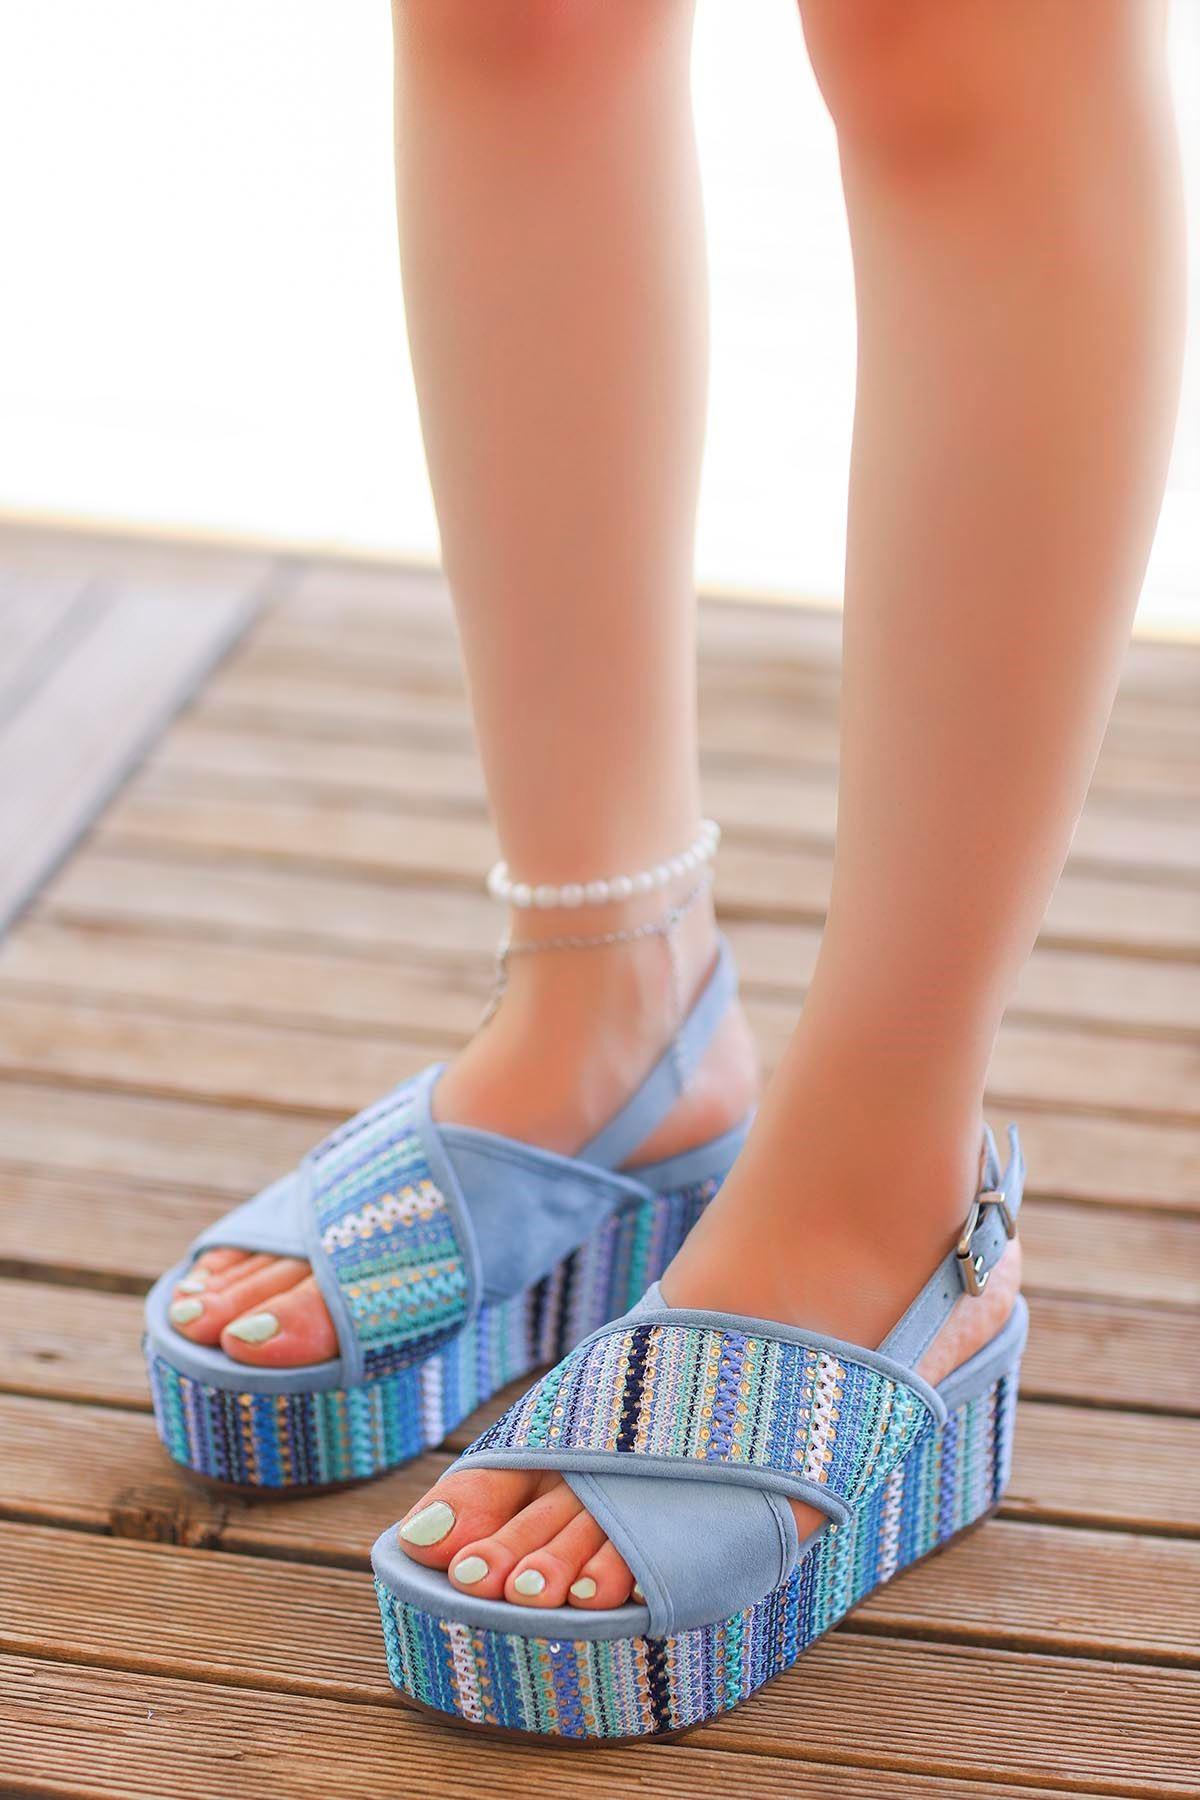 Guja Pul Detay Çapraz Dolgu Taban Sandalet Bebe Mavisi 20Y182